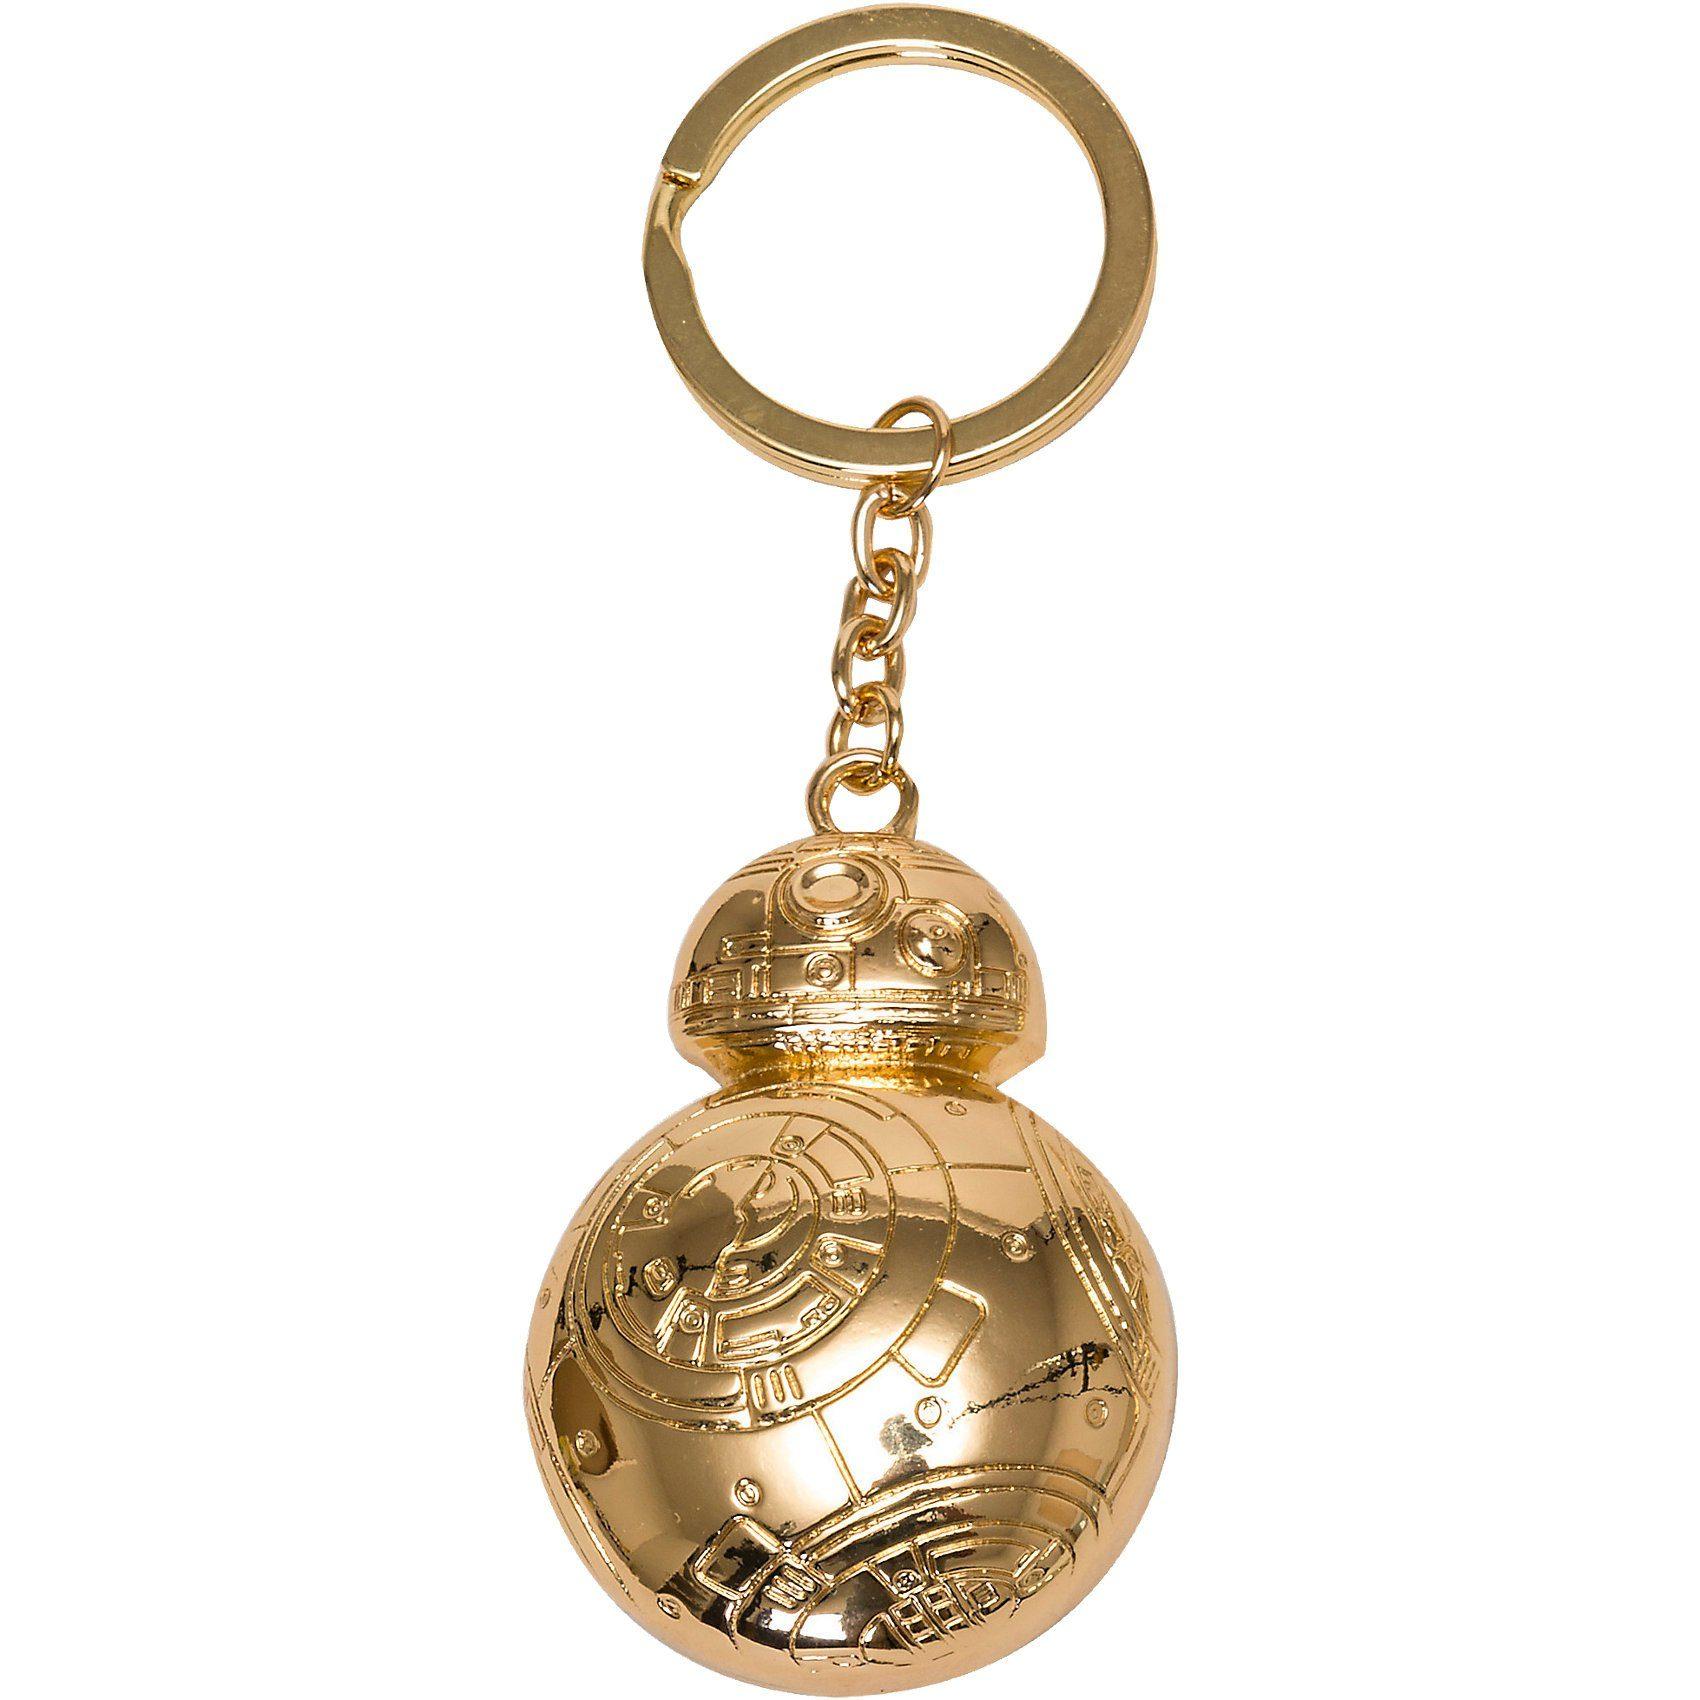 Joy Toy BB- 8 vergoldeter Schlüsselanhänger Metall